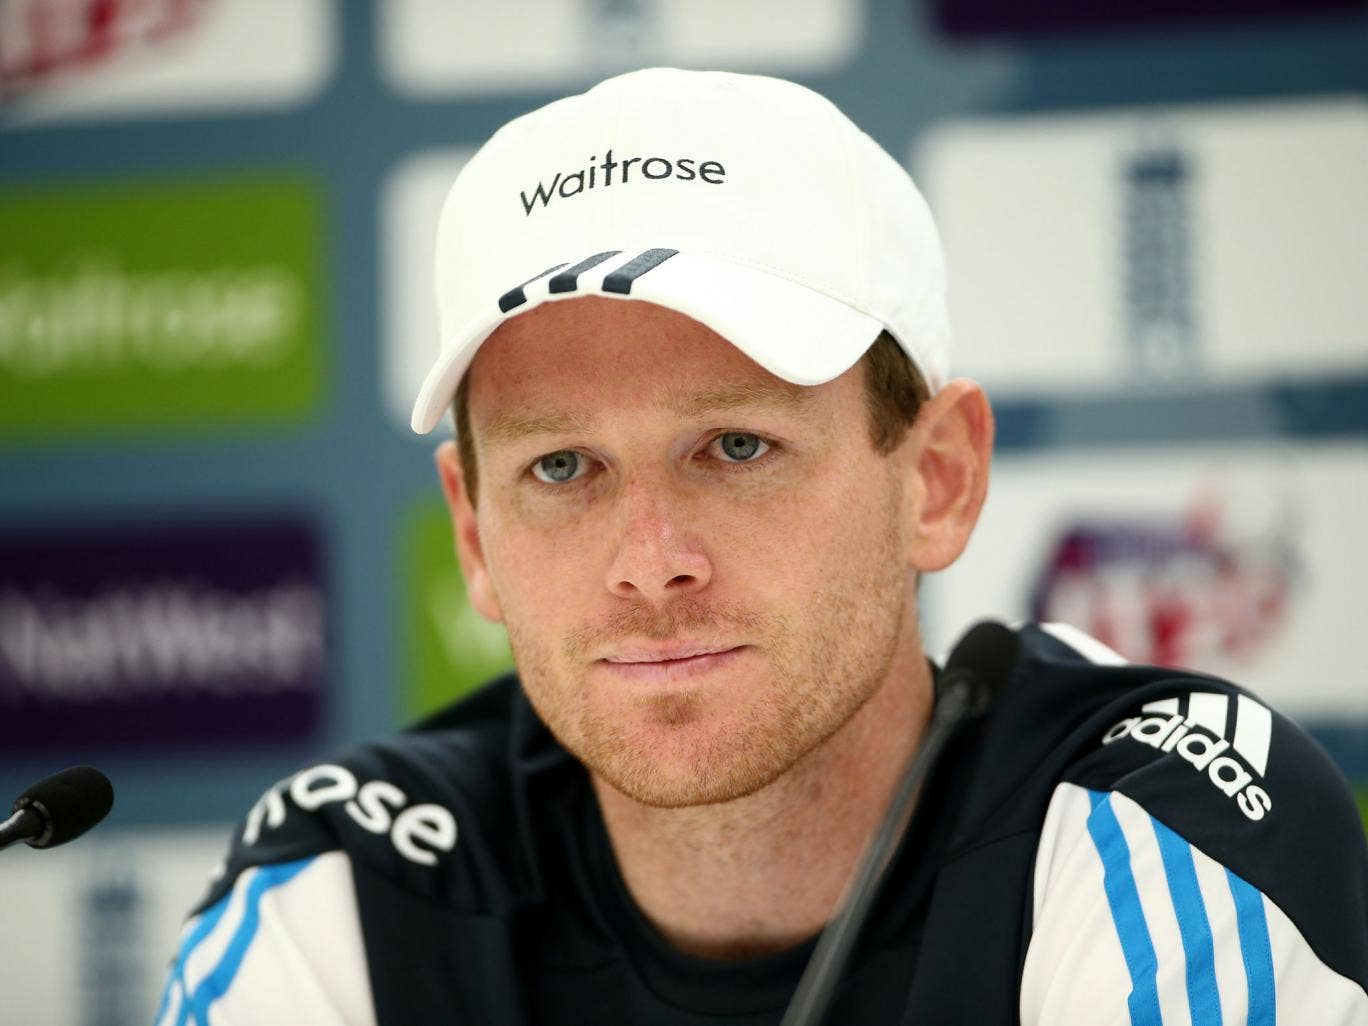 Eoin Morgan captains England after Stuart Broad's knee injury